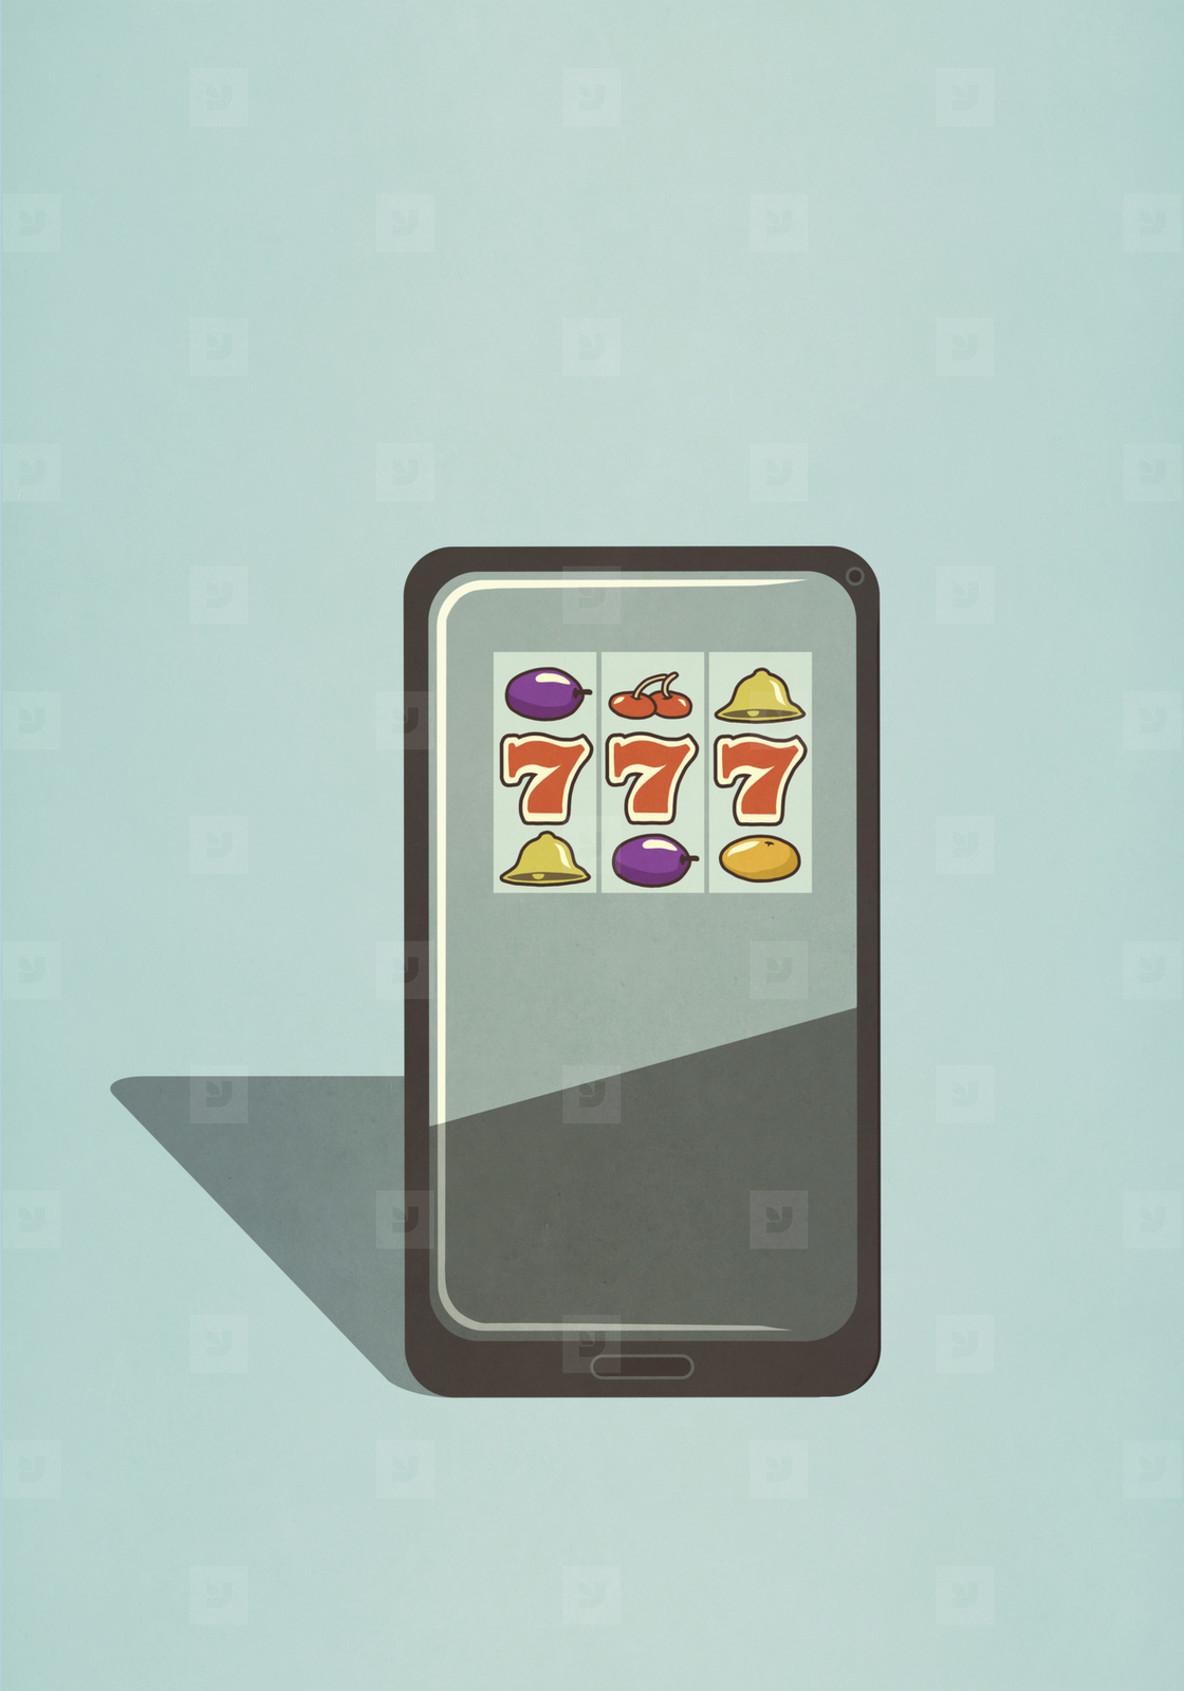 Slot machine game on smart phone screen